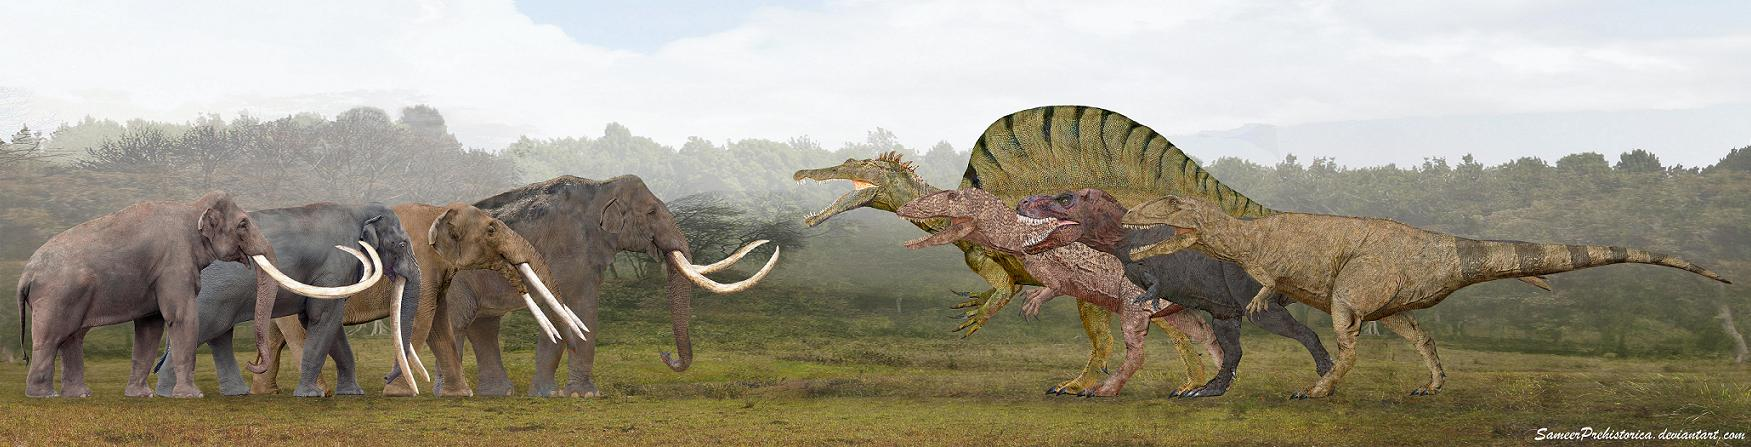 Proboscideans Vs Theropods | Dinosaur Home